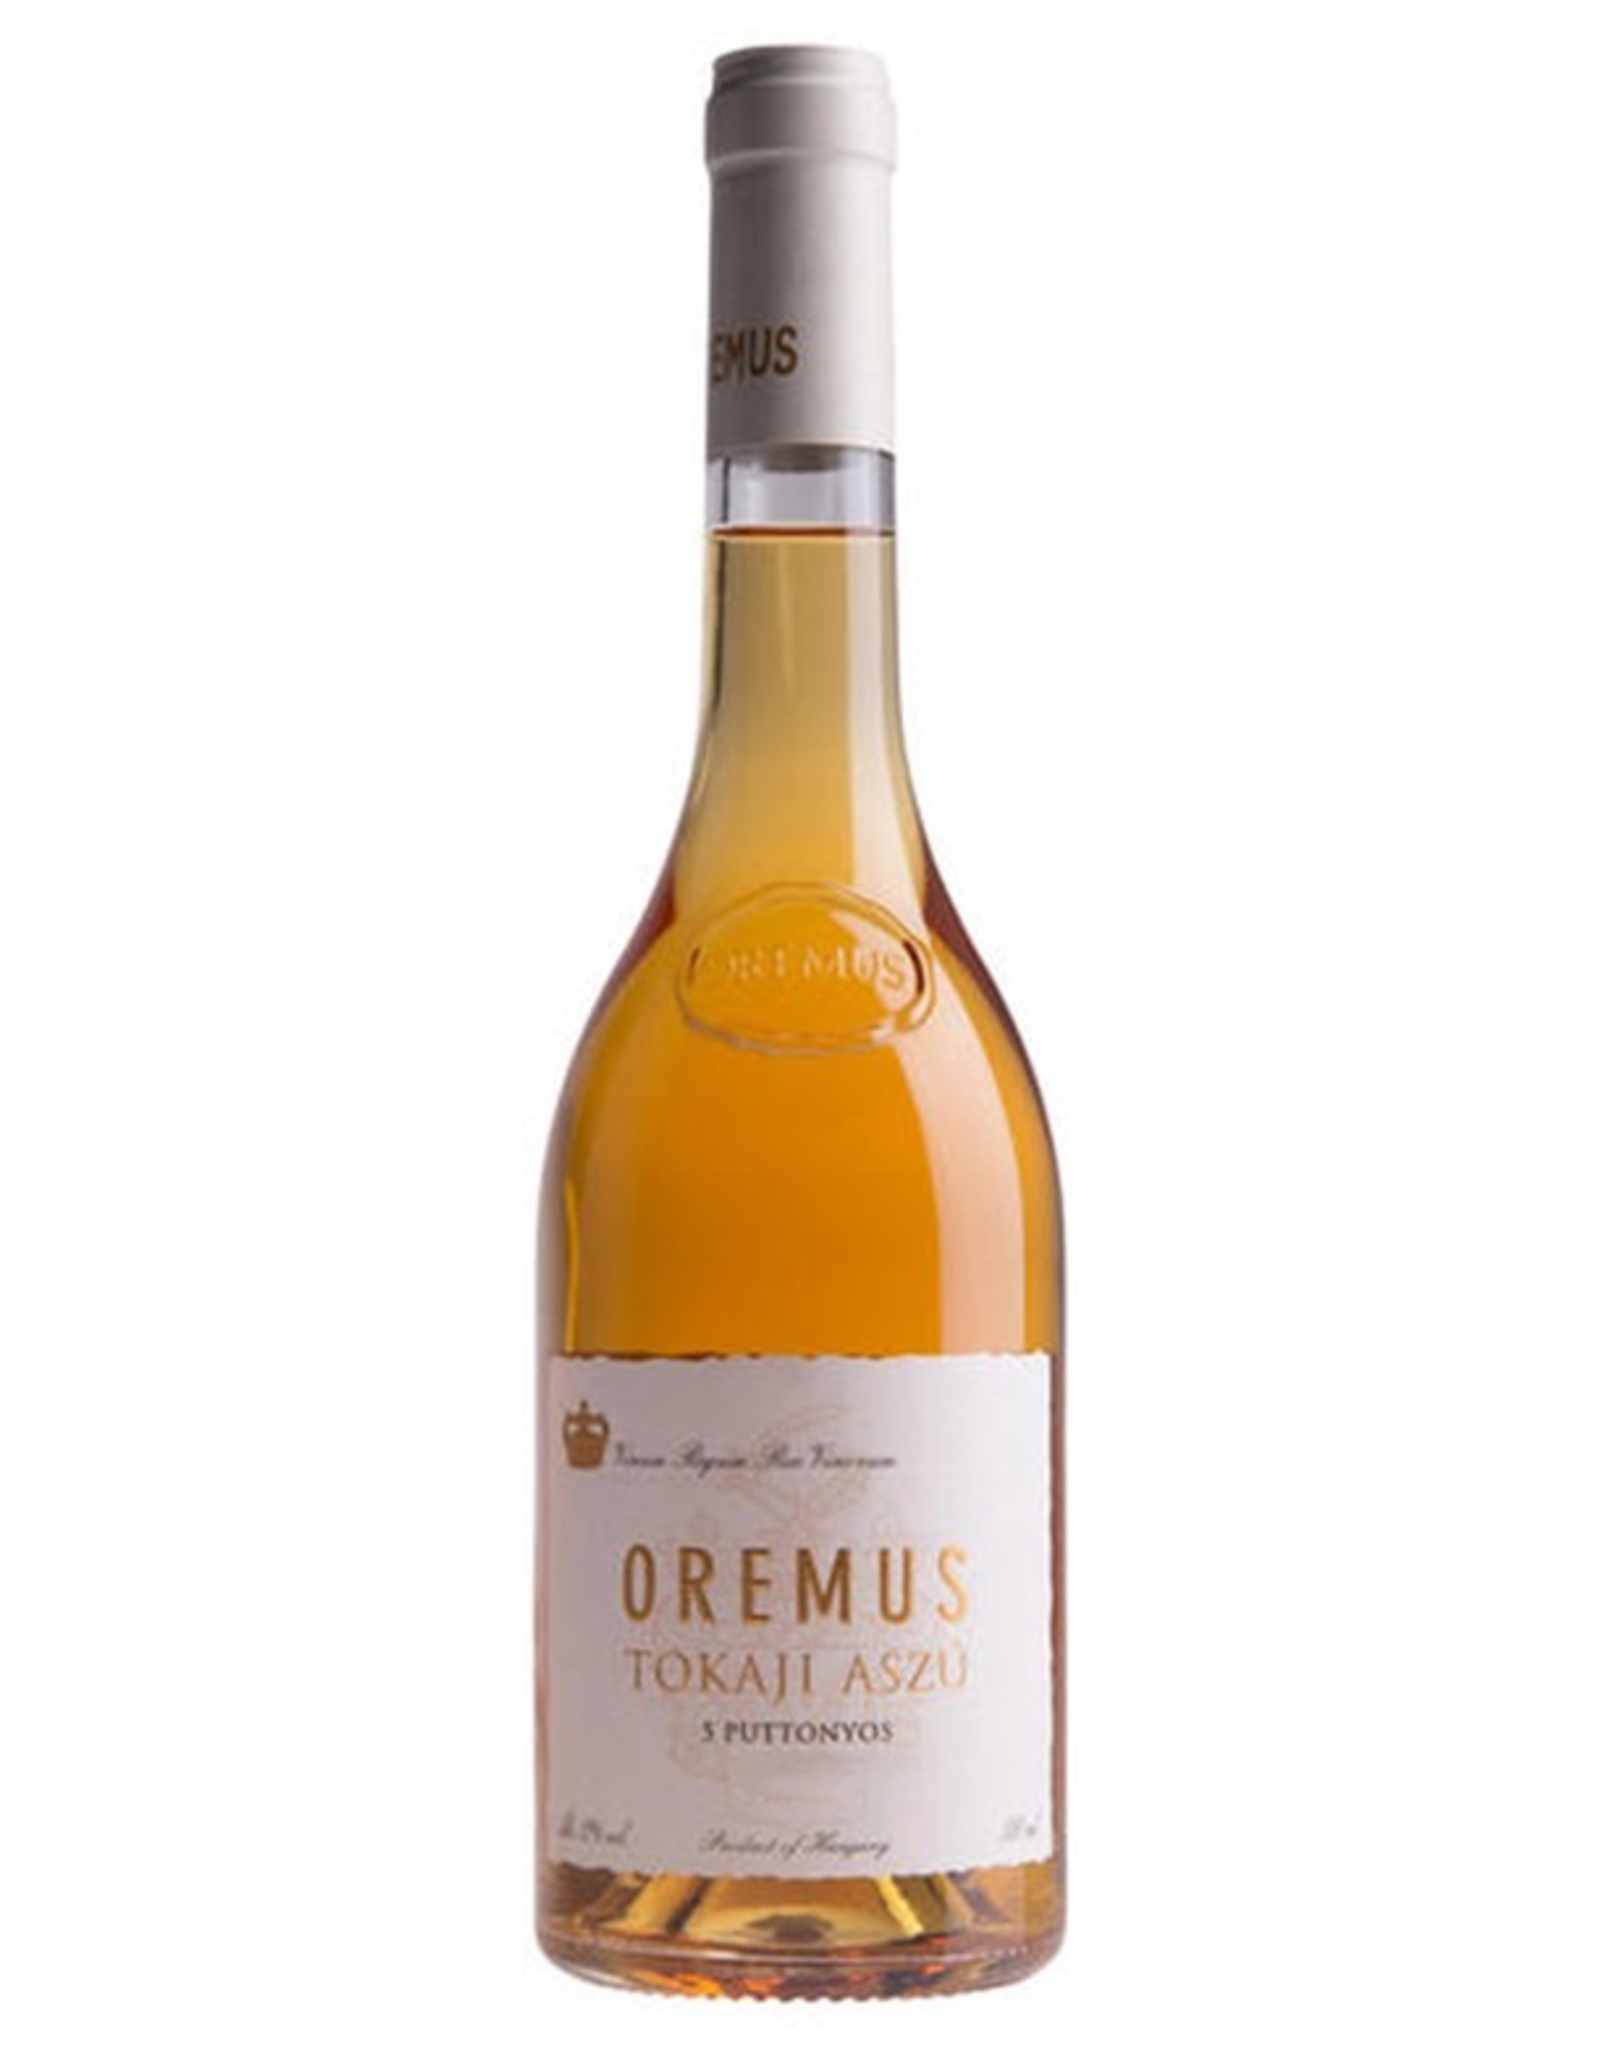 White Wine 2010, 500ml Oremus Tokaji Aszu 5 Puttonyos by Vega Sicilia, Furmint, Mad, Tokaji, Hungary, 11.5% Alc, CTnr